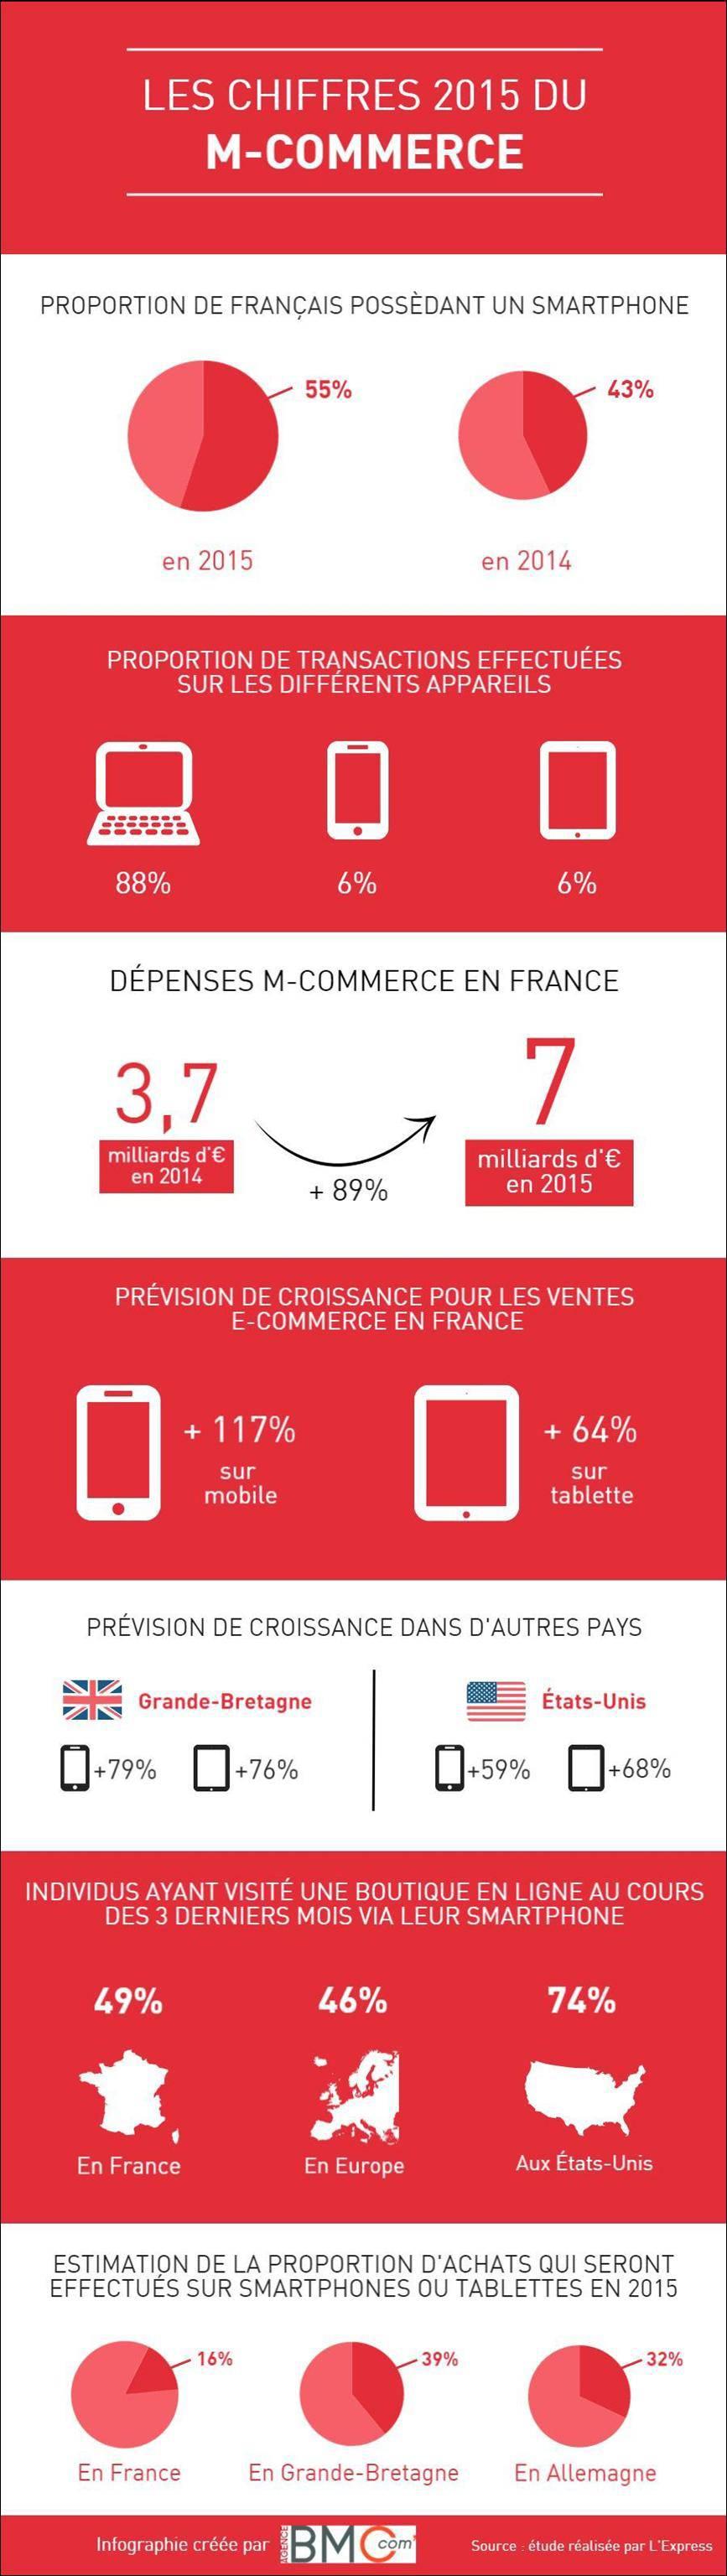 m-commerce 2015